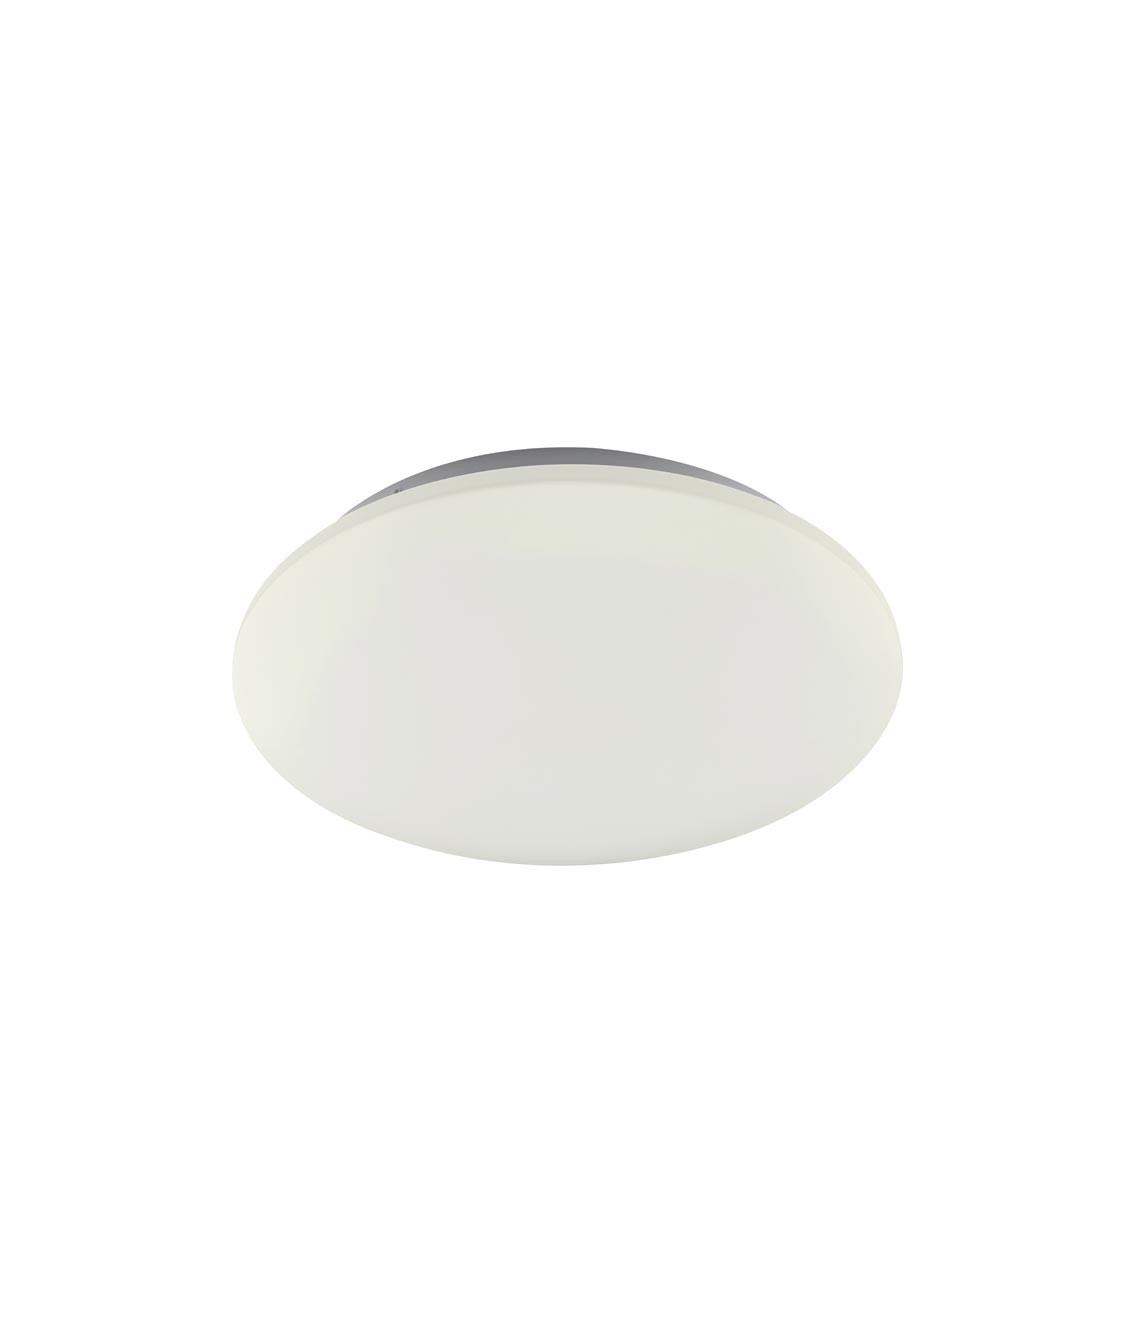 Plafón pequeño luz cálida LED ZERO II